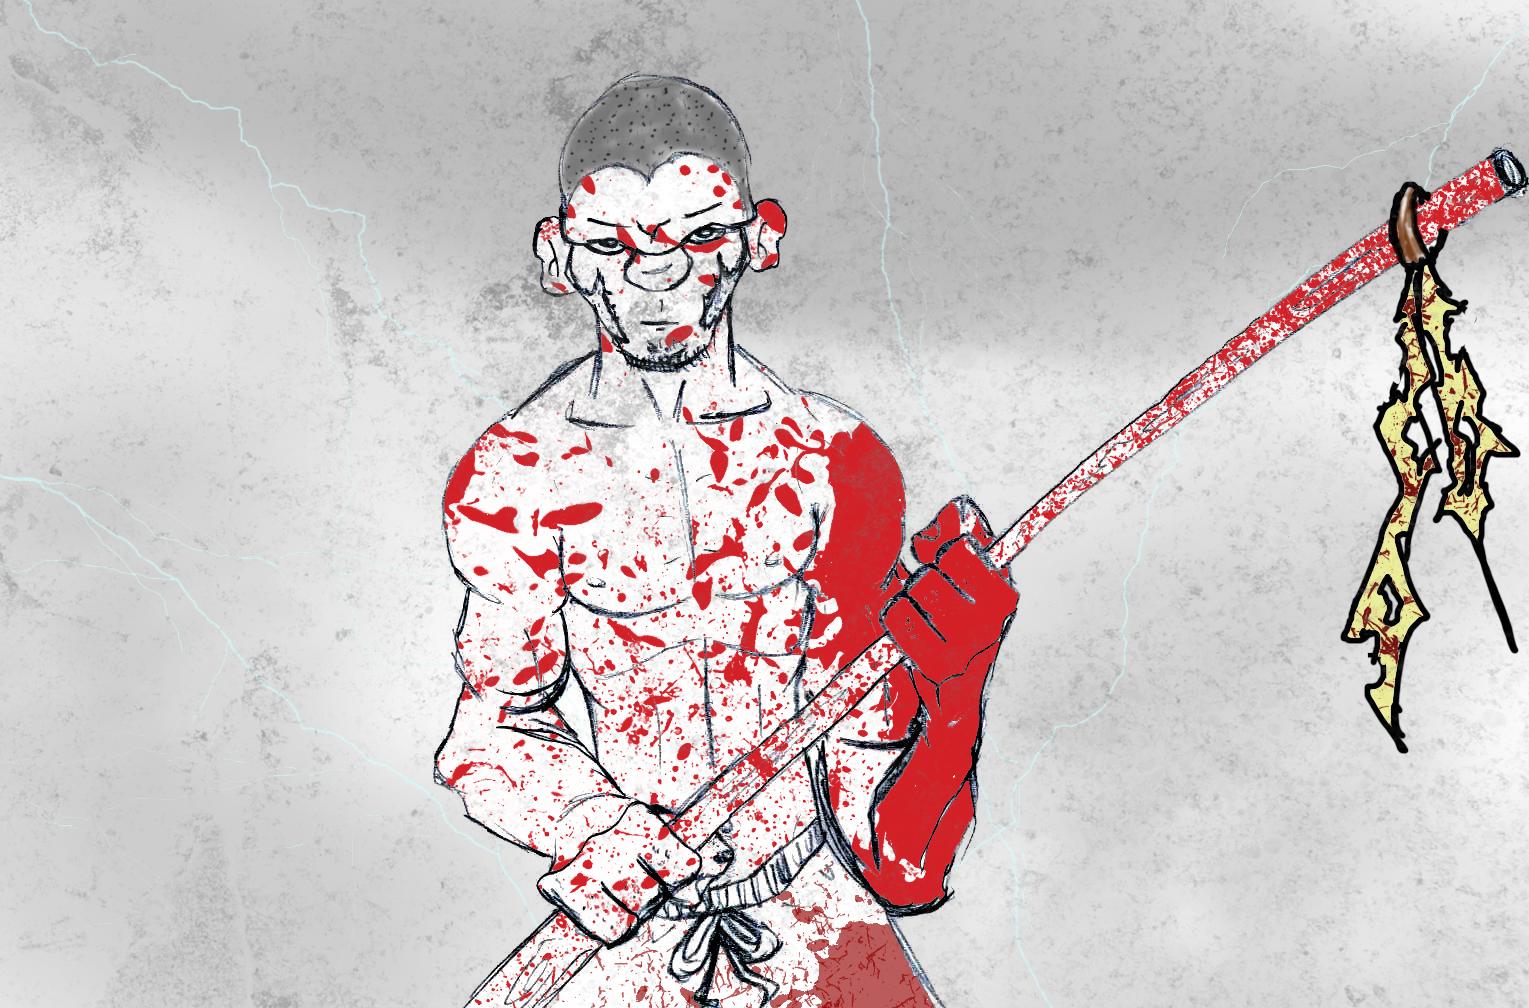 BLOODY MONK